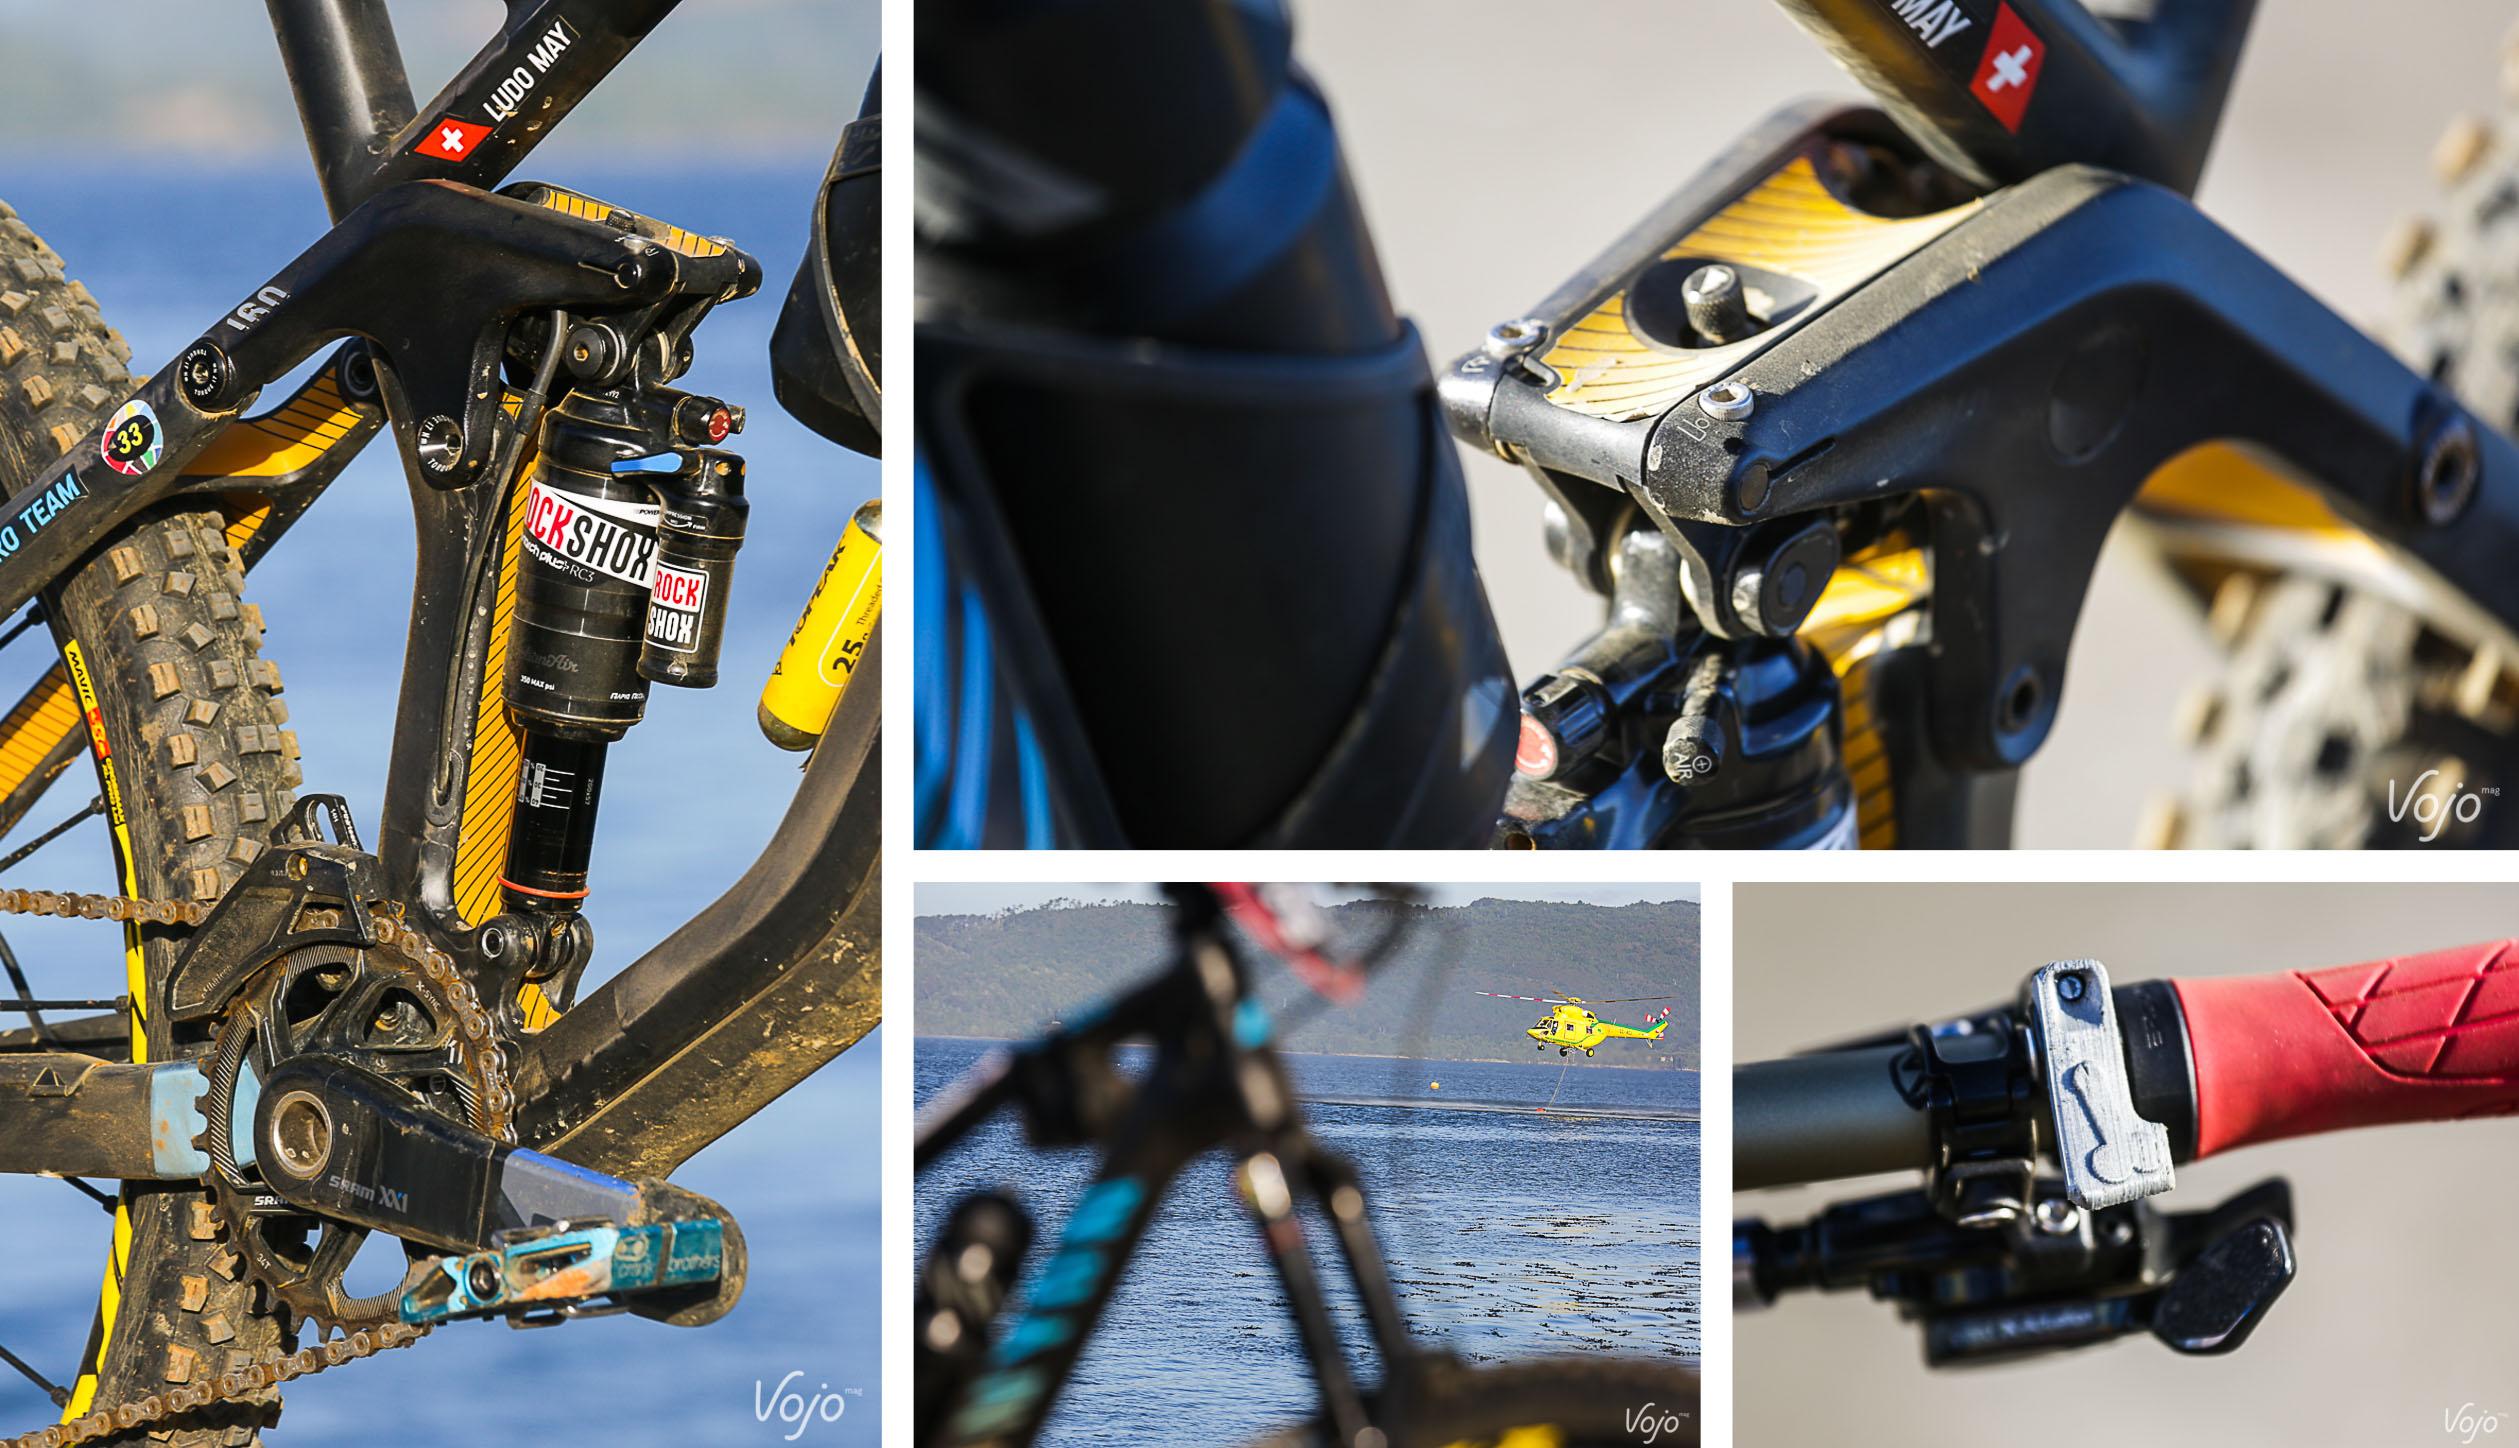 17-Bike_Check_EWS_2016_Copyright_Reuiller_Vojomag-1